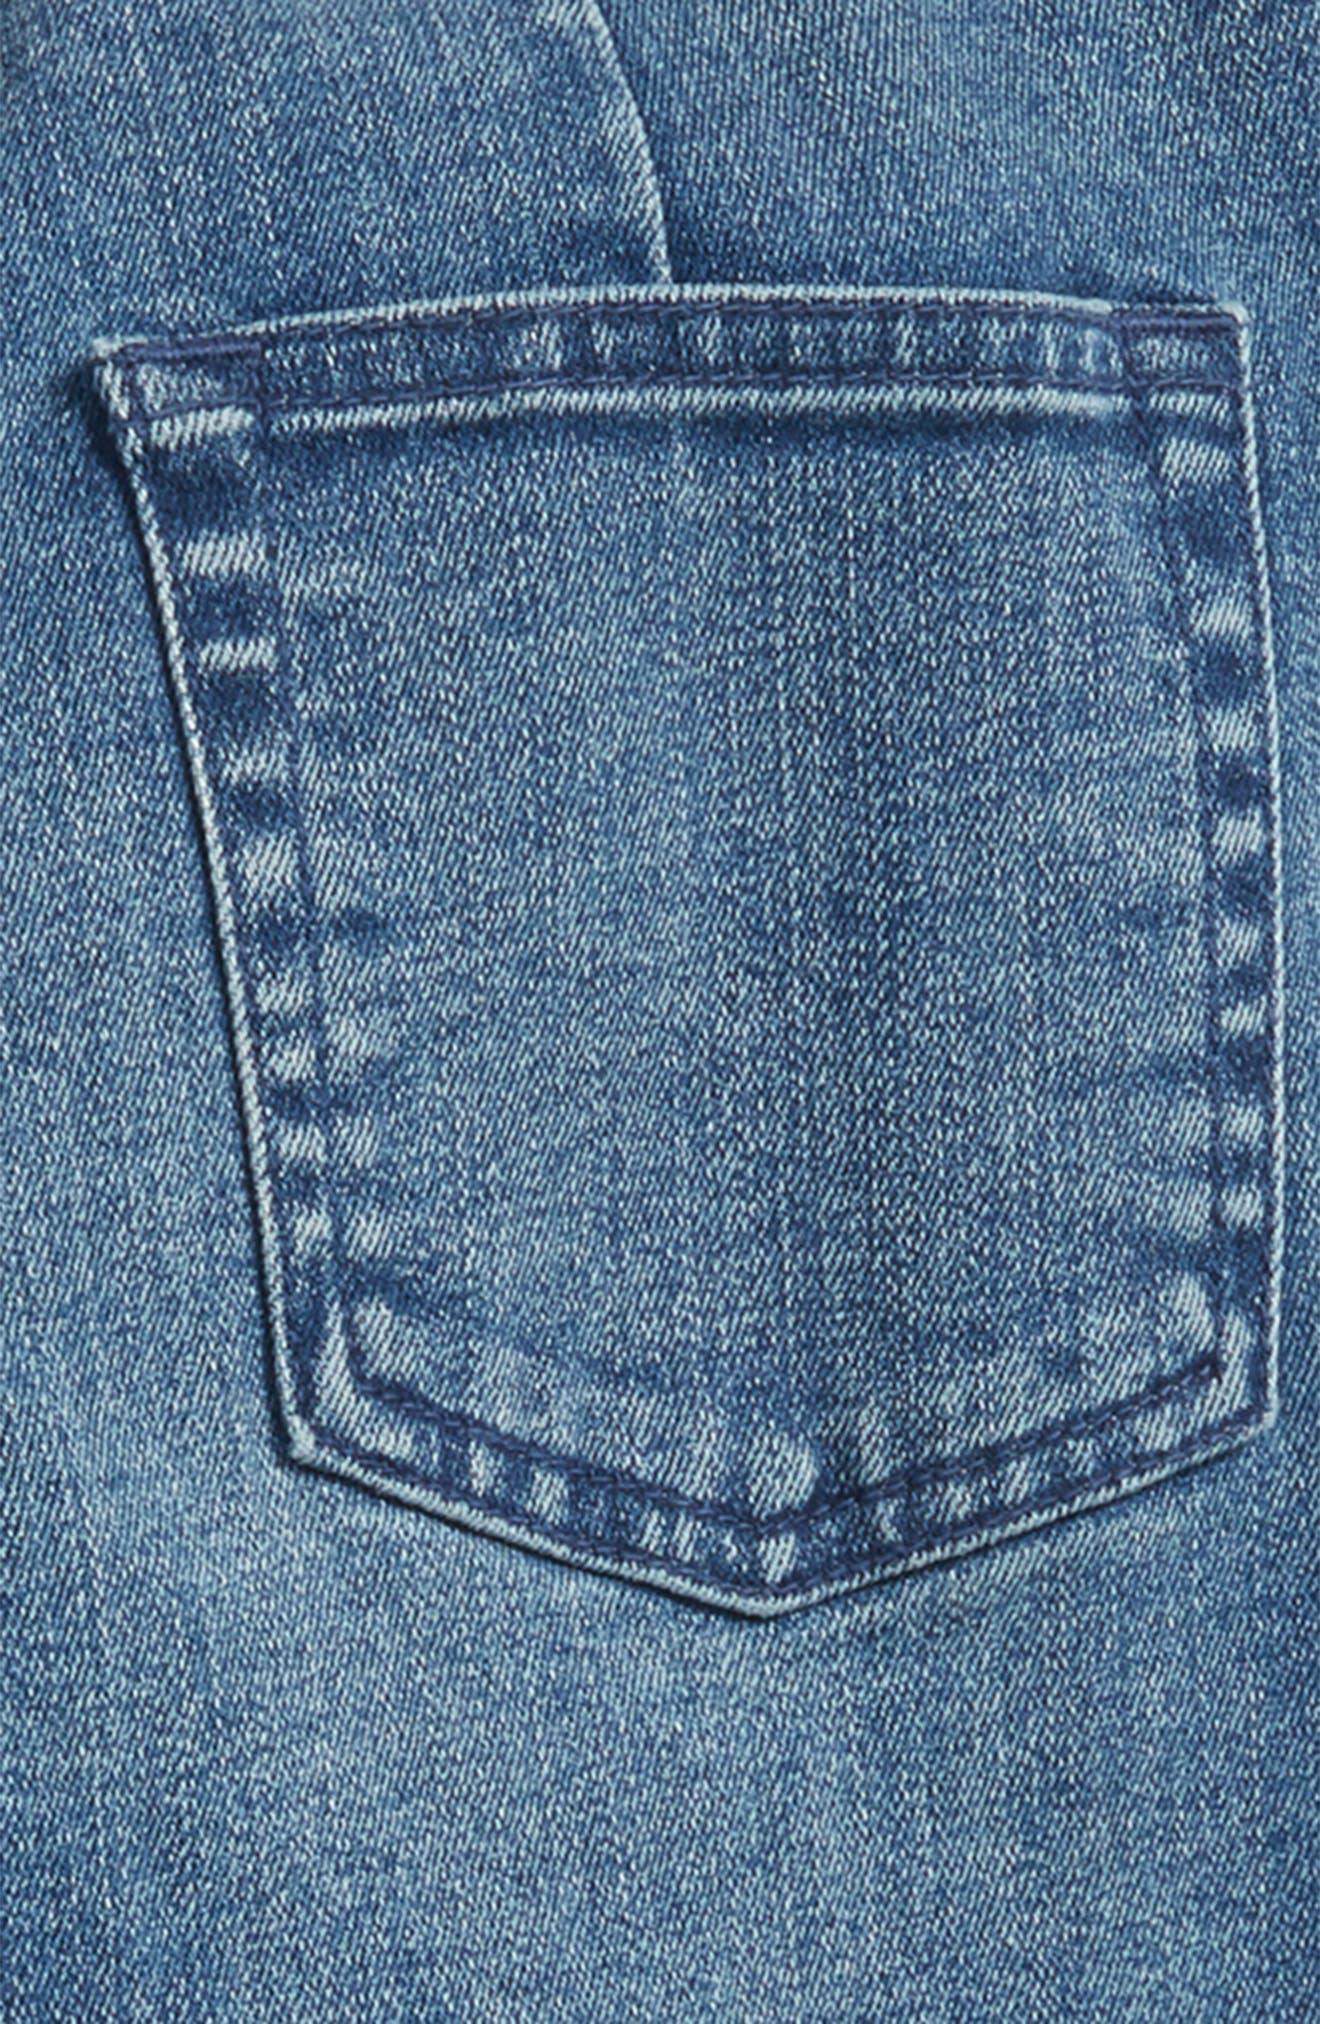 Pull-On Denim Pants,                             Alternate thumbnail 3, color,                             400